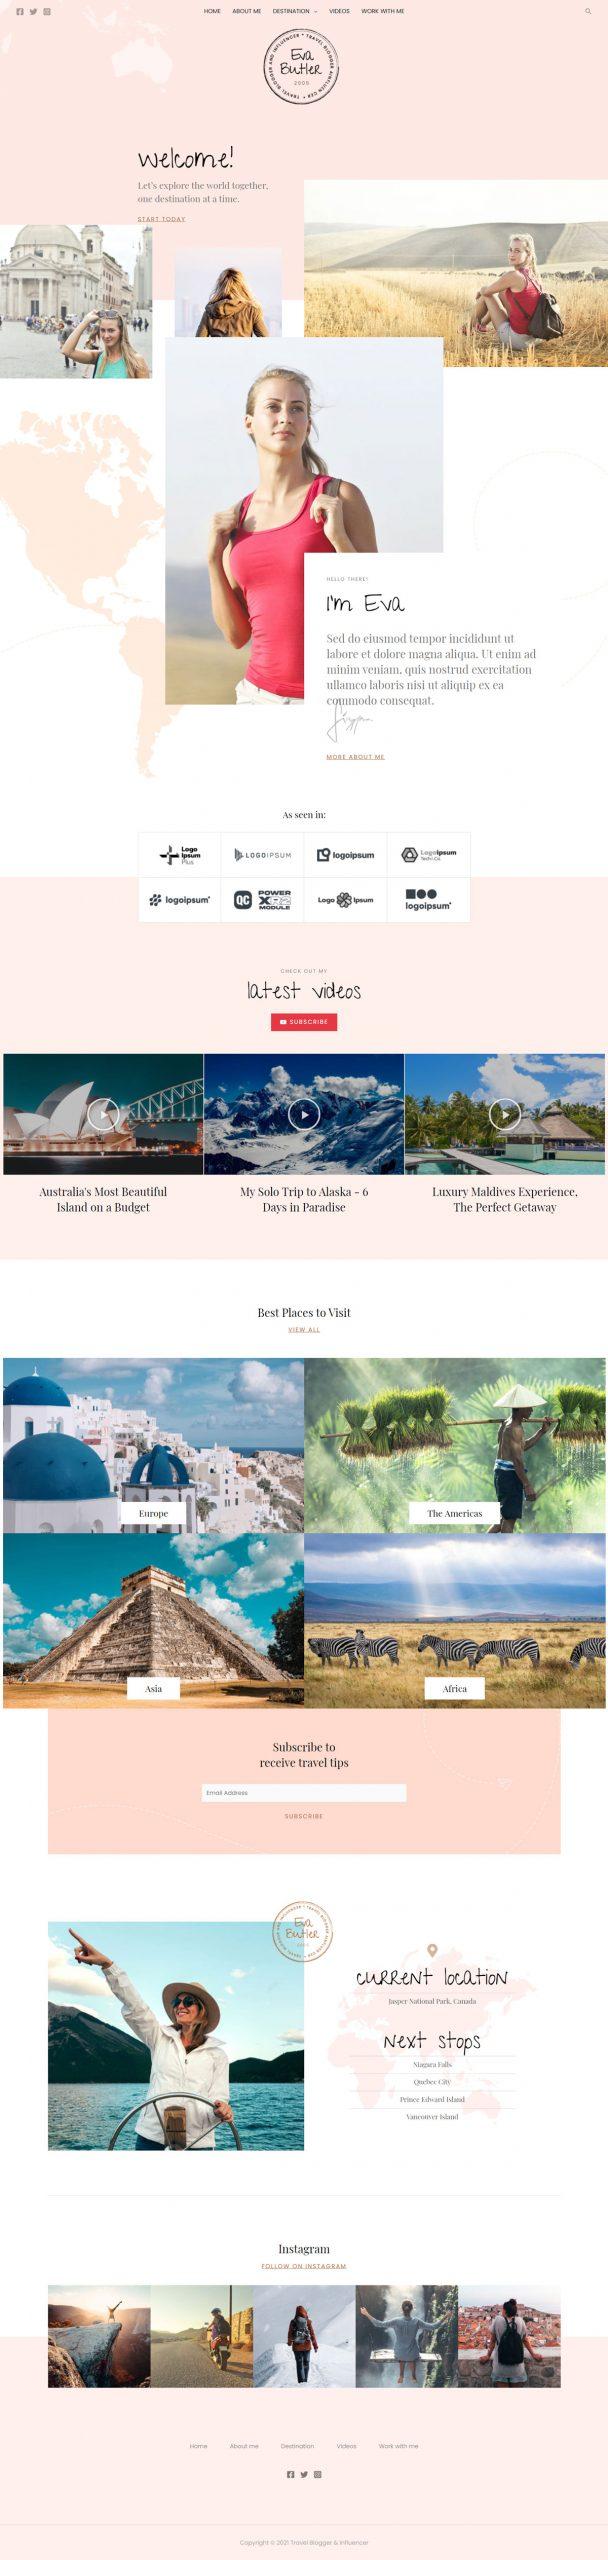 Adamo Web Design | Web Design Durham | travel blogger 02 home scaled